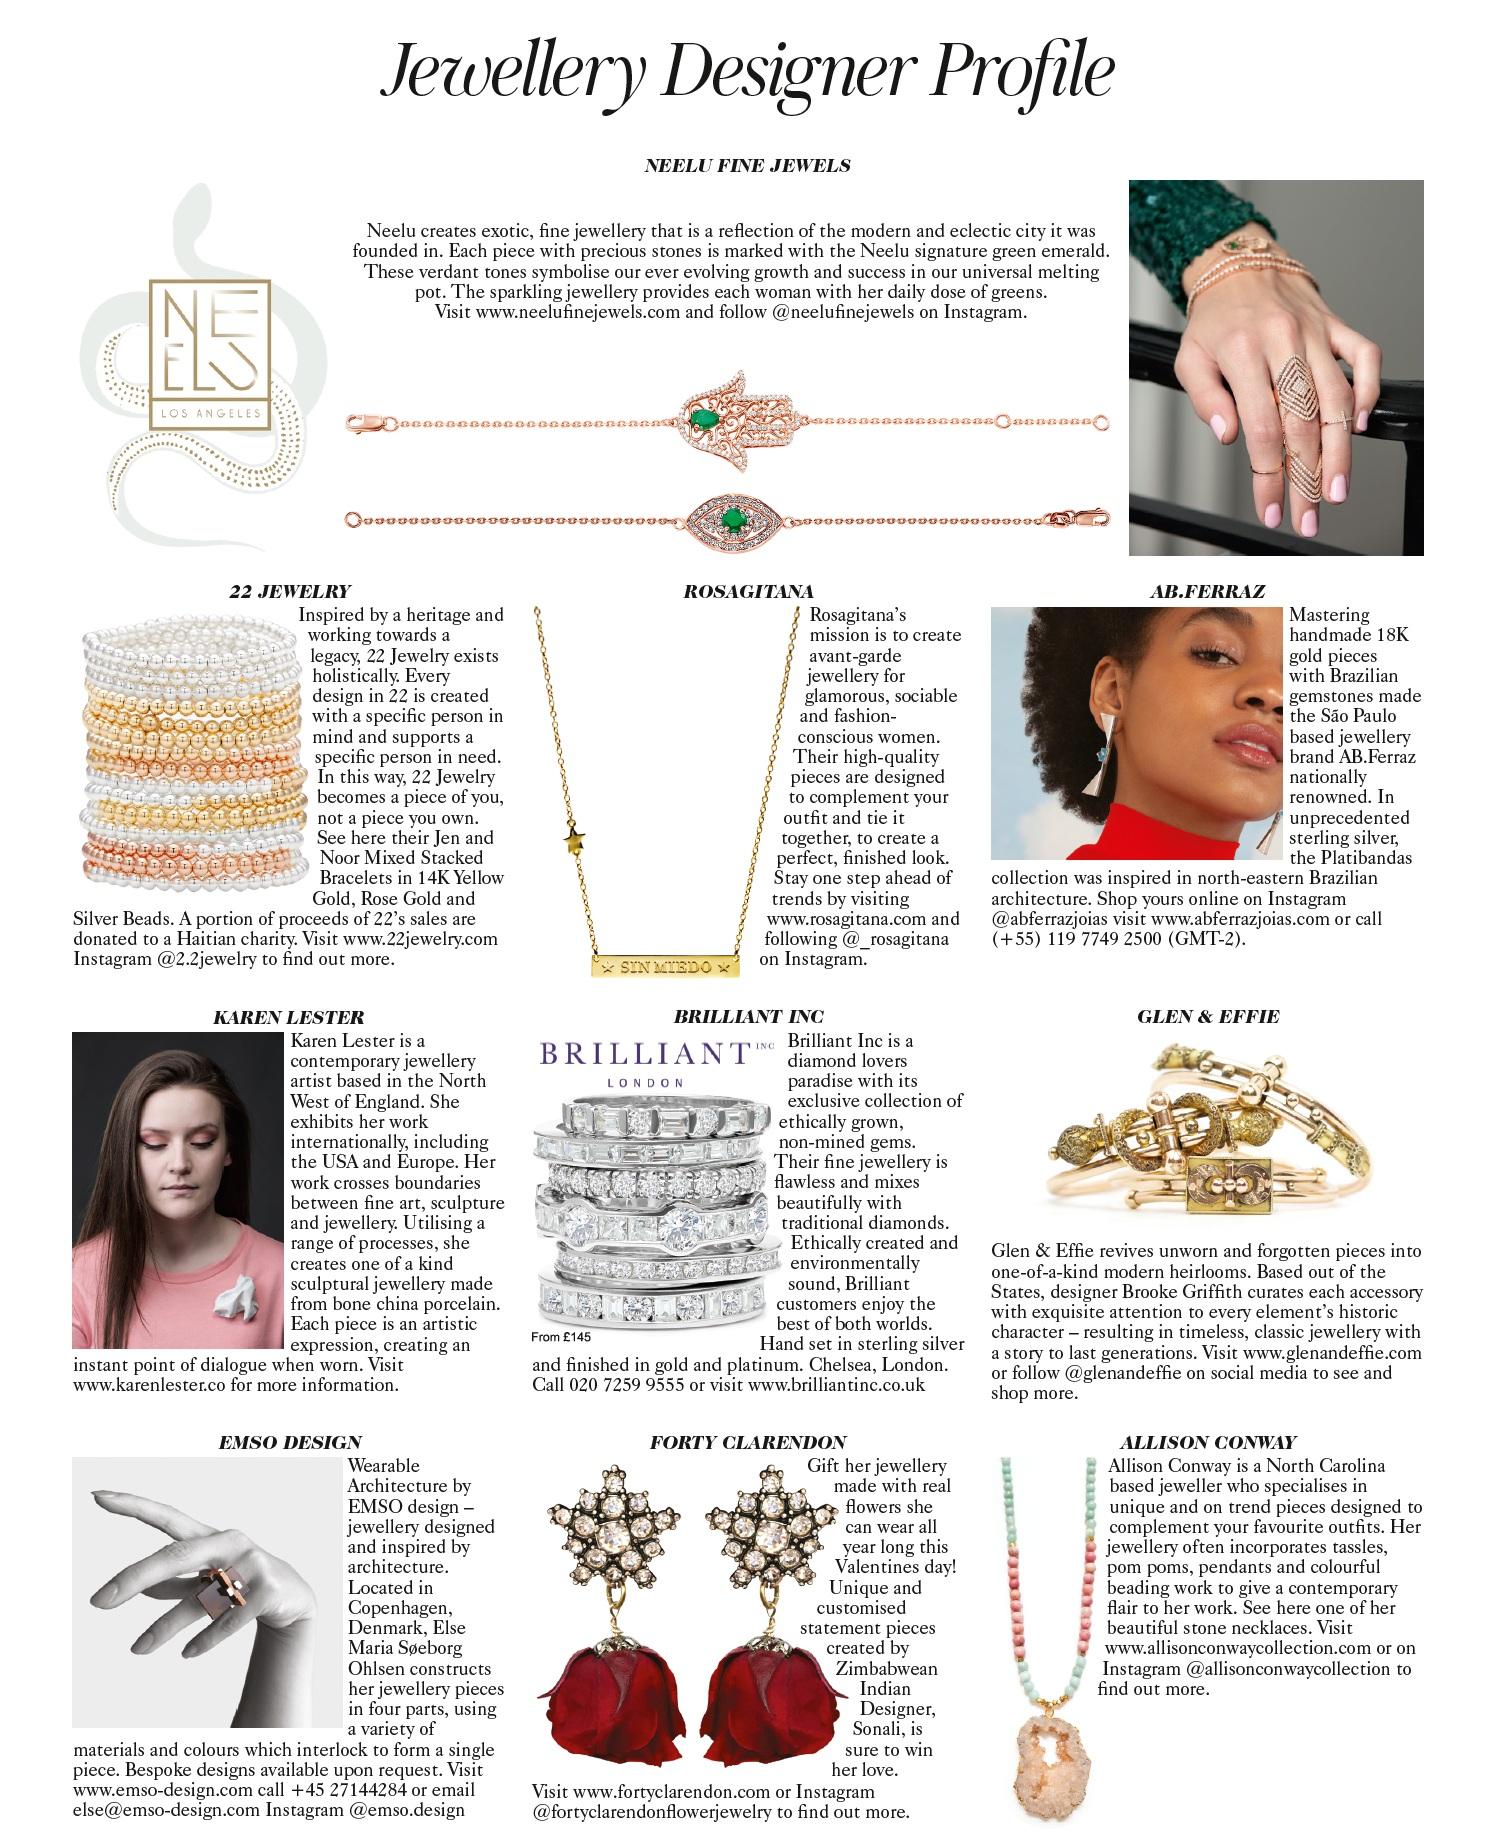 200+-+Jewellery+Designer+Profile.jpg